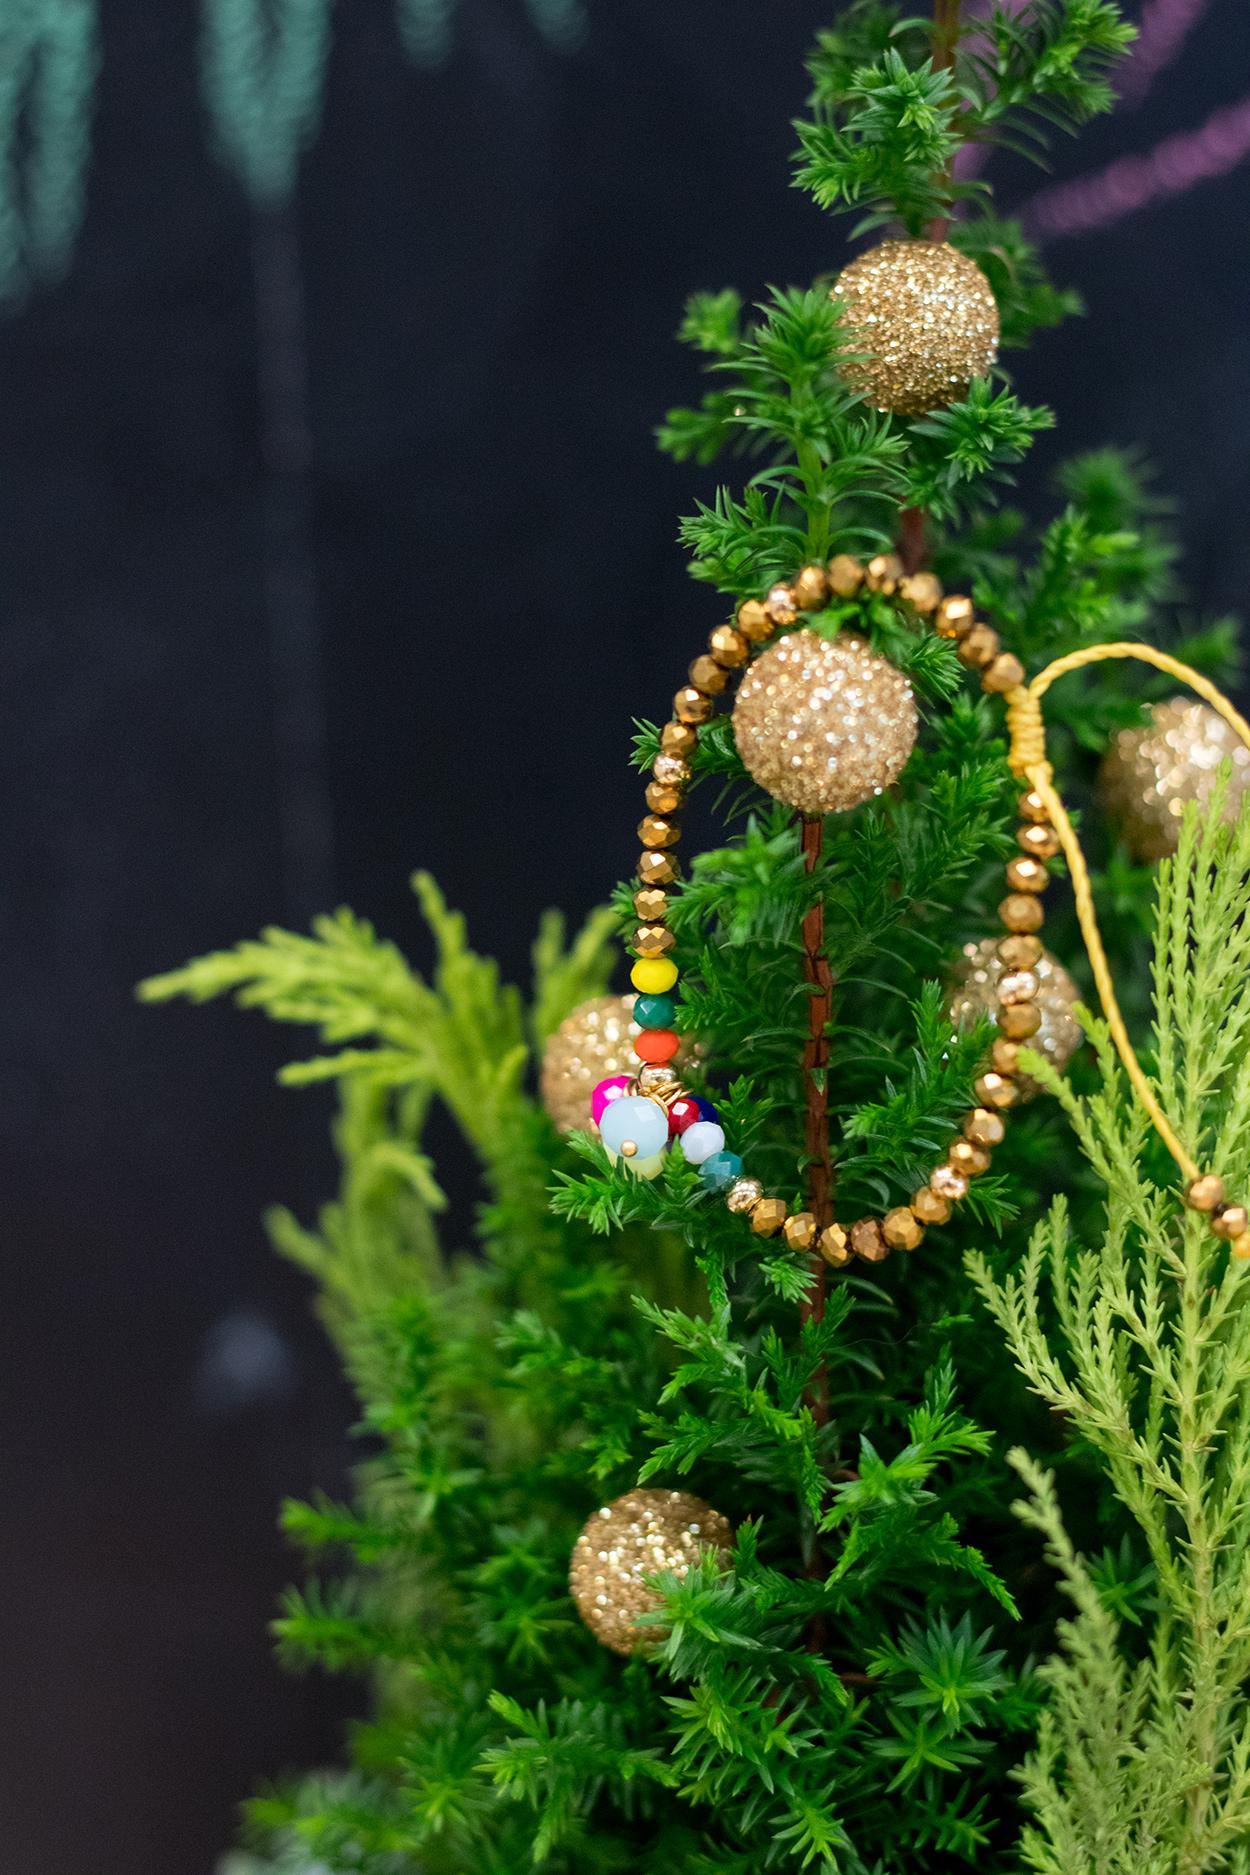 Christmas Decor | The Key To Blog Blogging Creative Workshop